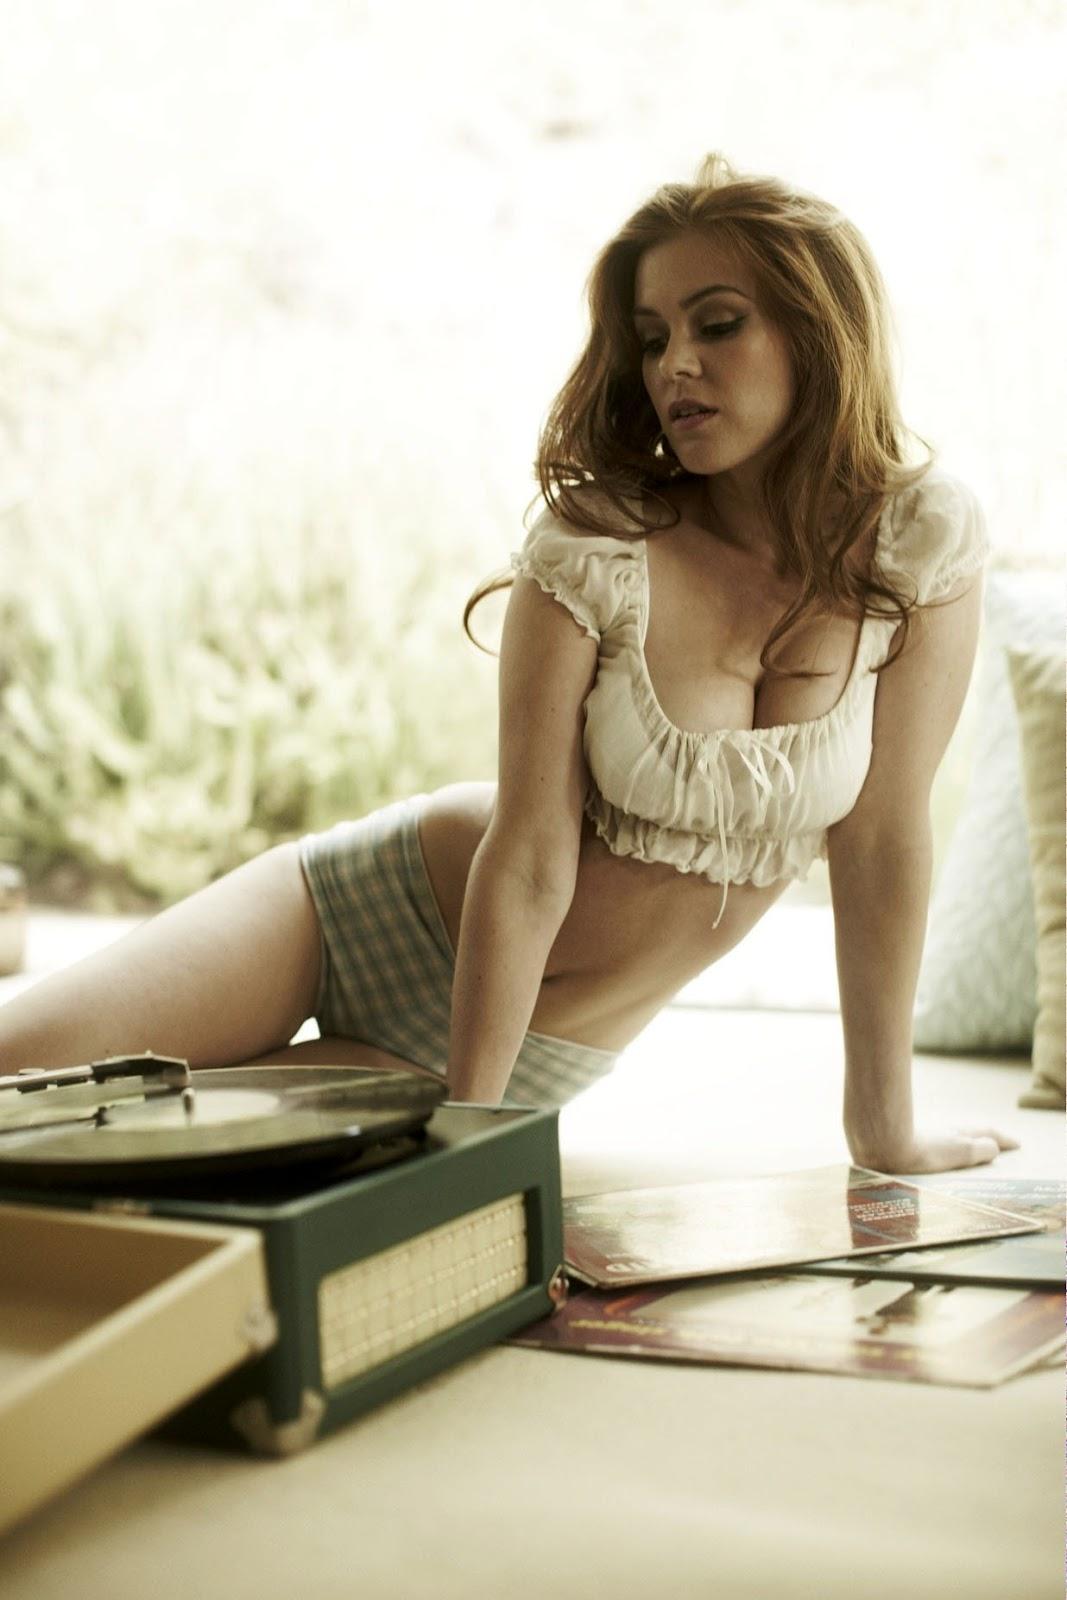 http://1.bp.blogspot.com/-iEW0MRvz7zM/UI0j3njuaOI/AAAAAAAAF6o/X85NegADz3Q/s1600/Isla-Fisher-hot-cleavage-06.jpg